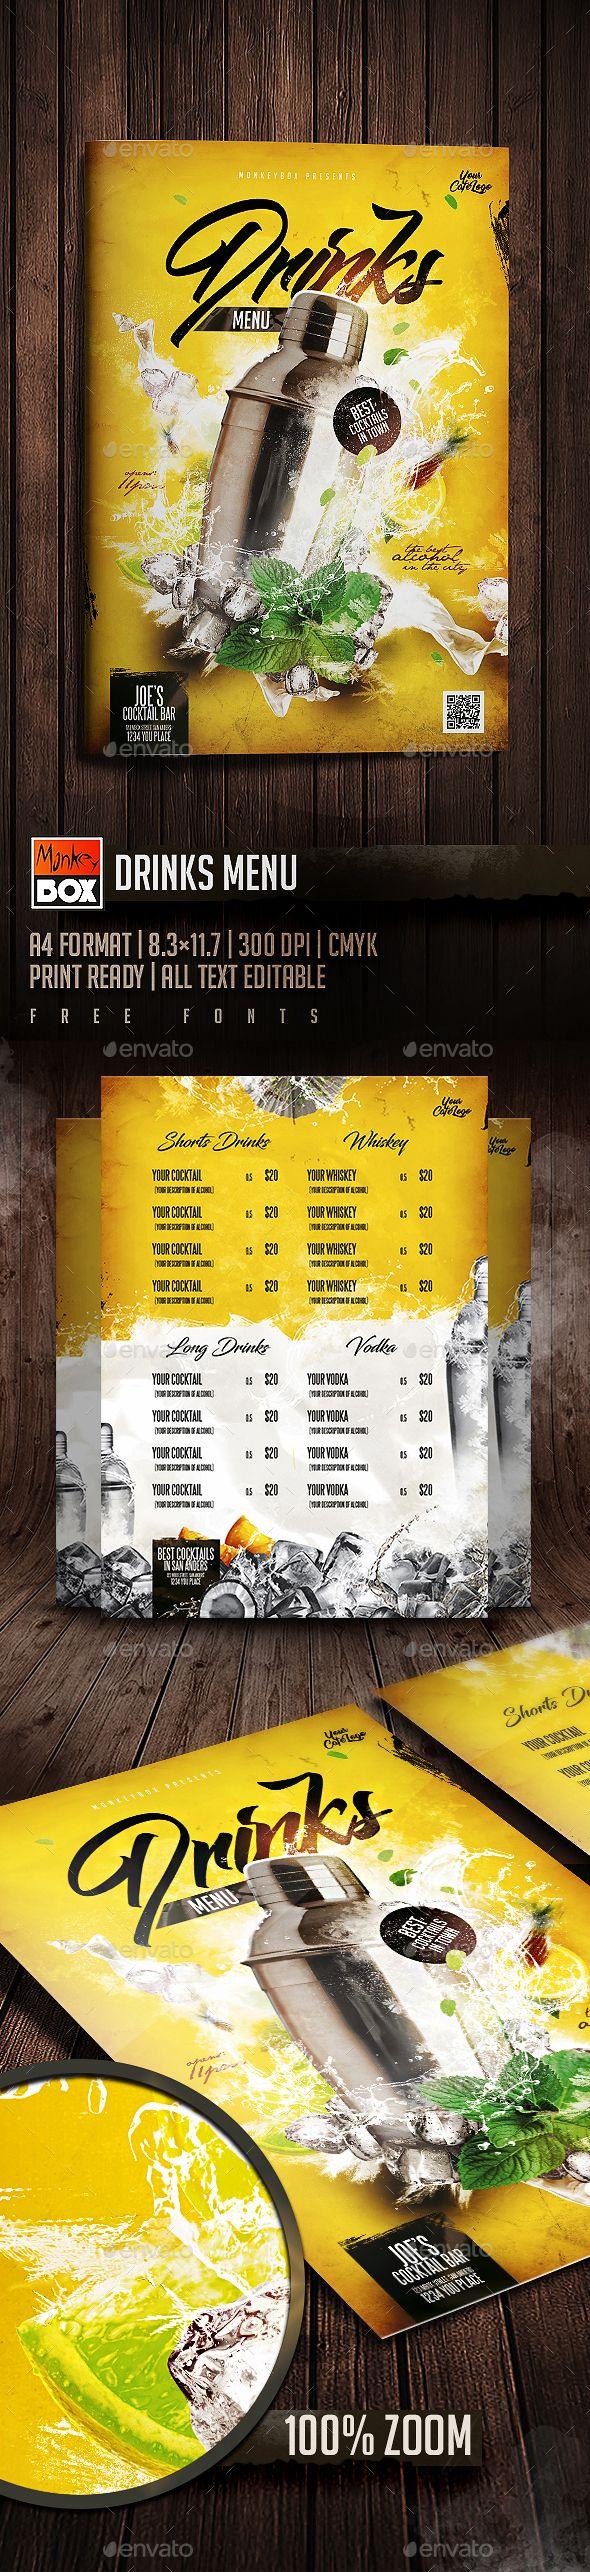 Drinks Menu — Photoshop PSD #mojito • Download ➝ https://graphicriver.net/item/drinks-menu/19746229?ref=pxcr